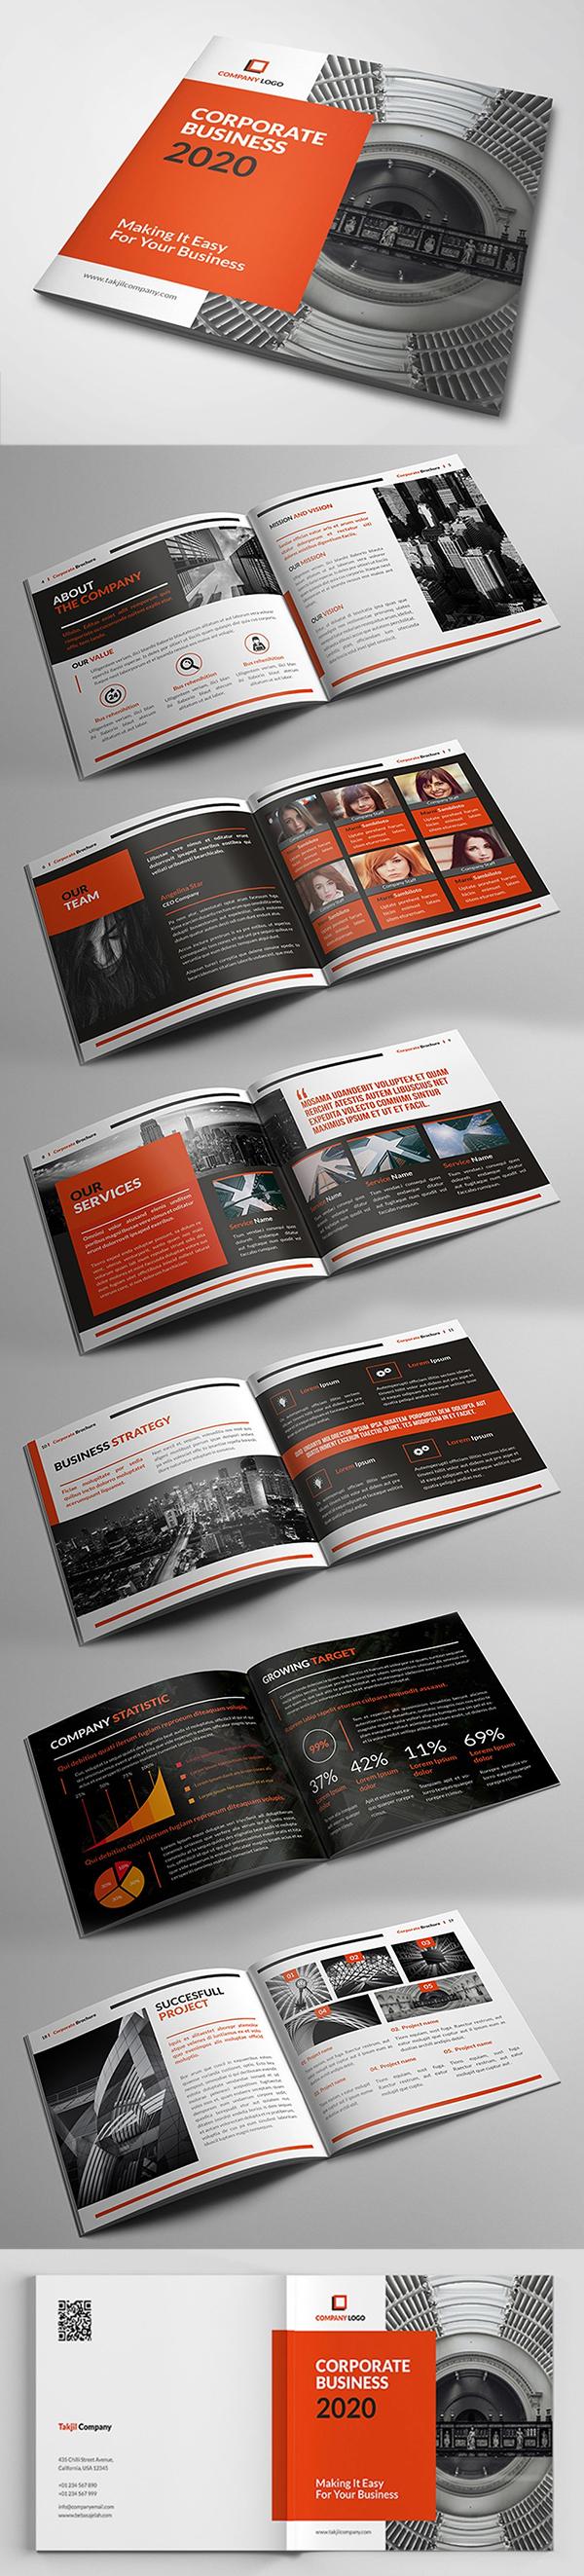 Square Corporate Brochure Template